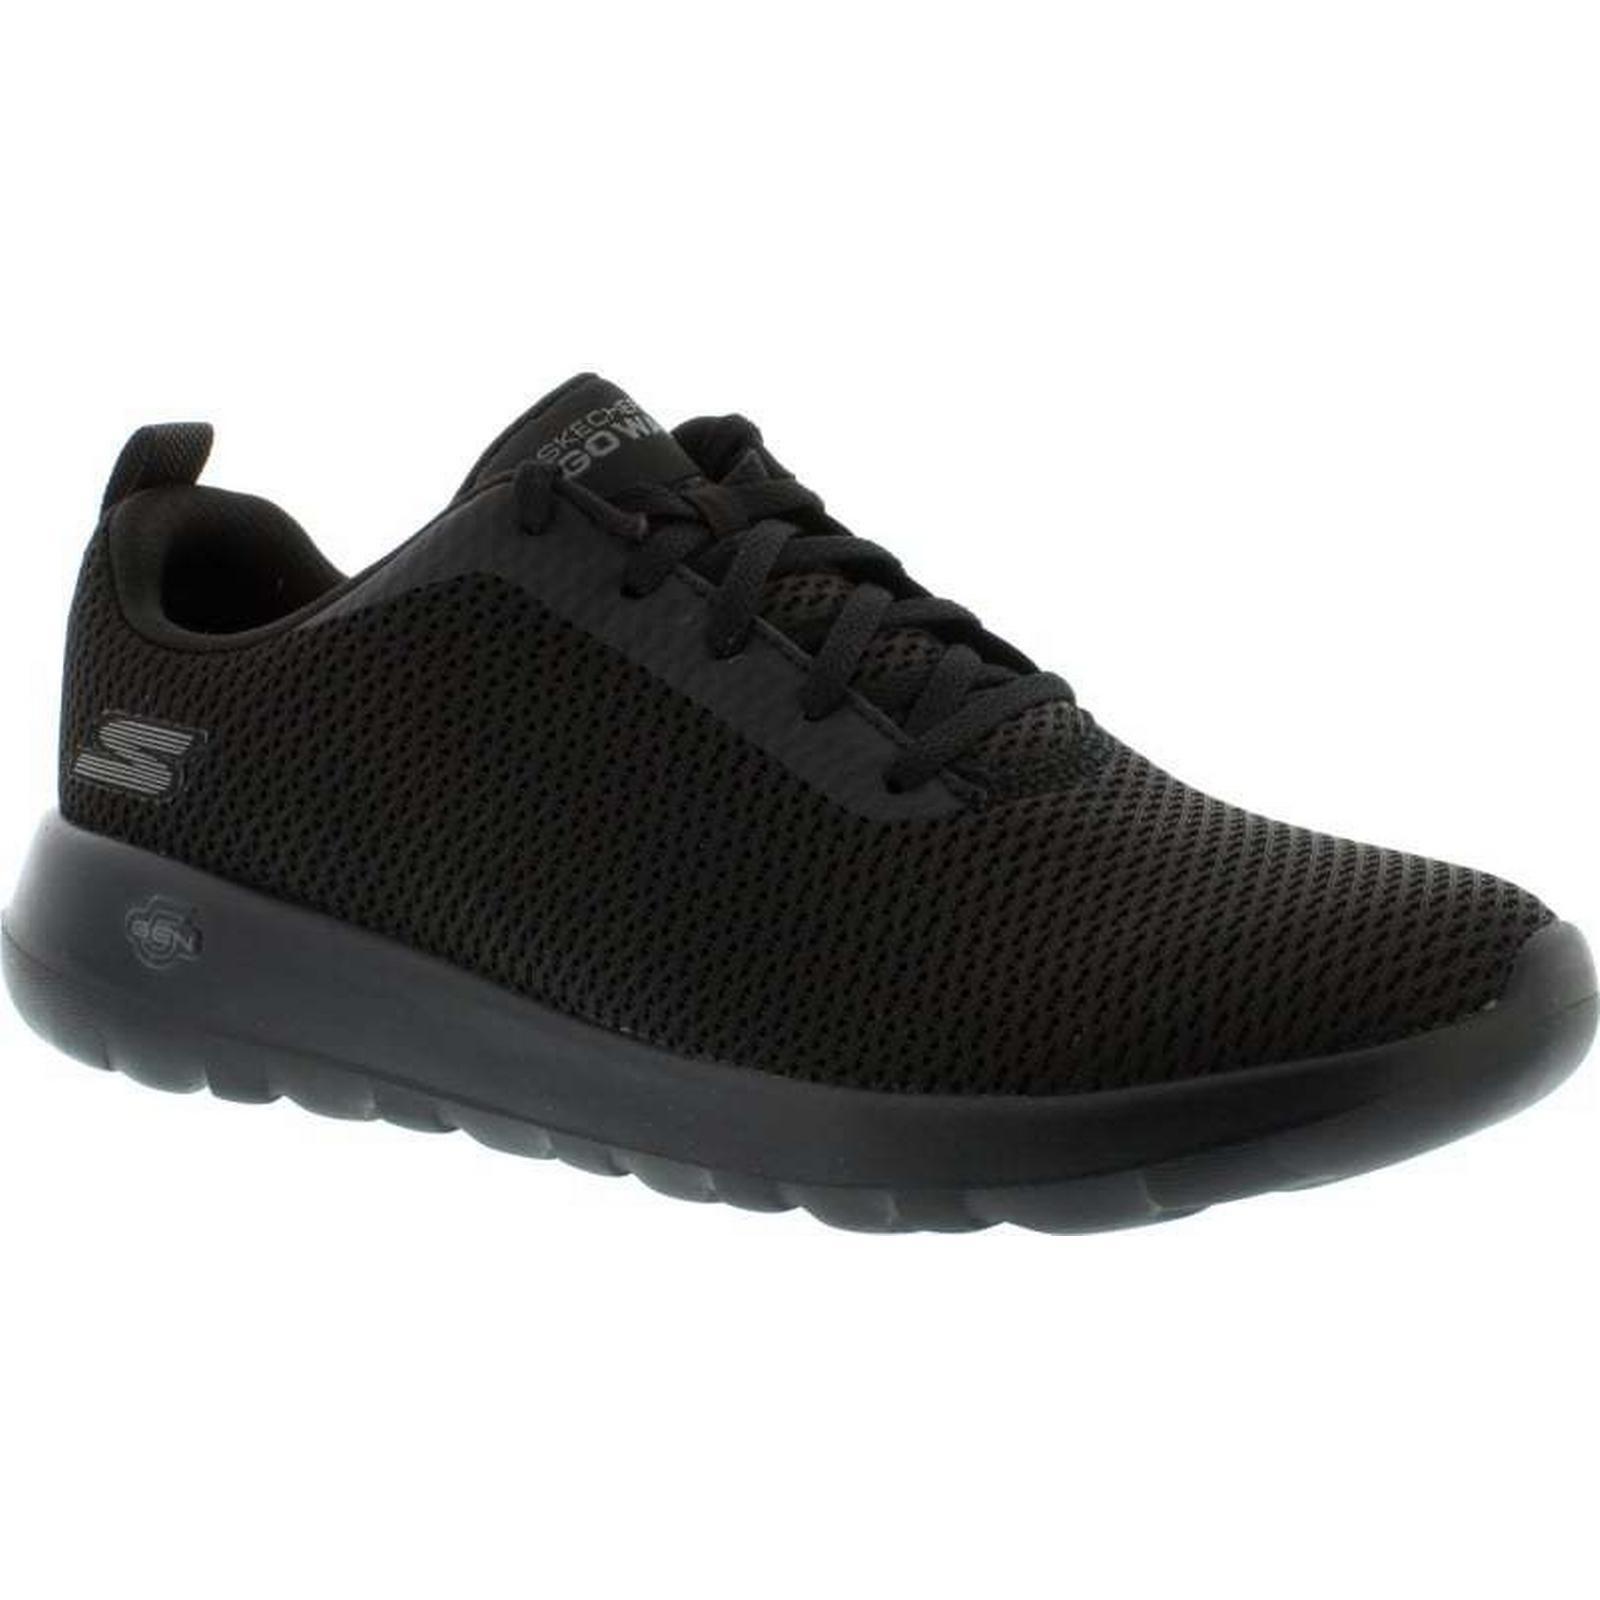 Skechers 54601 Go Walk Size: Max Effort - Black/Black Size: Walk 43 EU 8c1e56